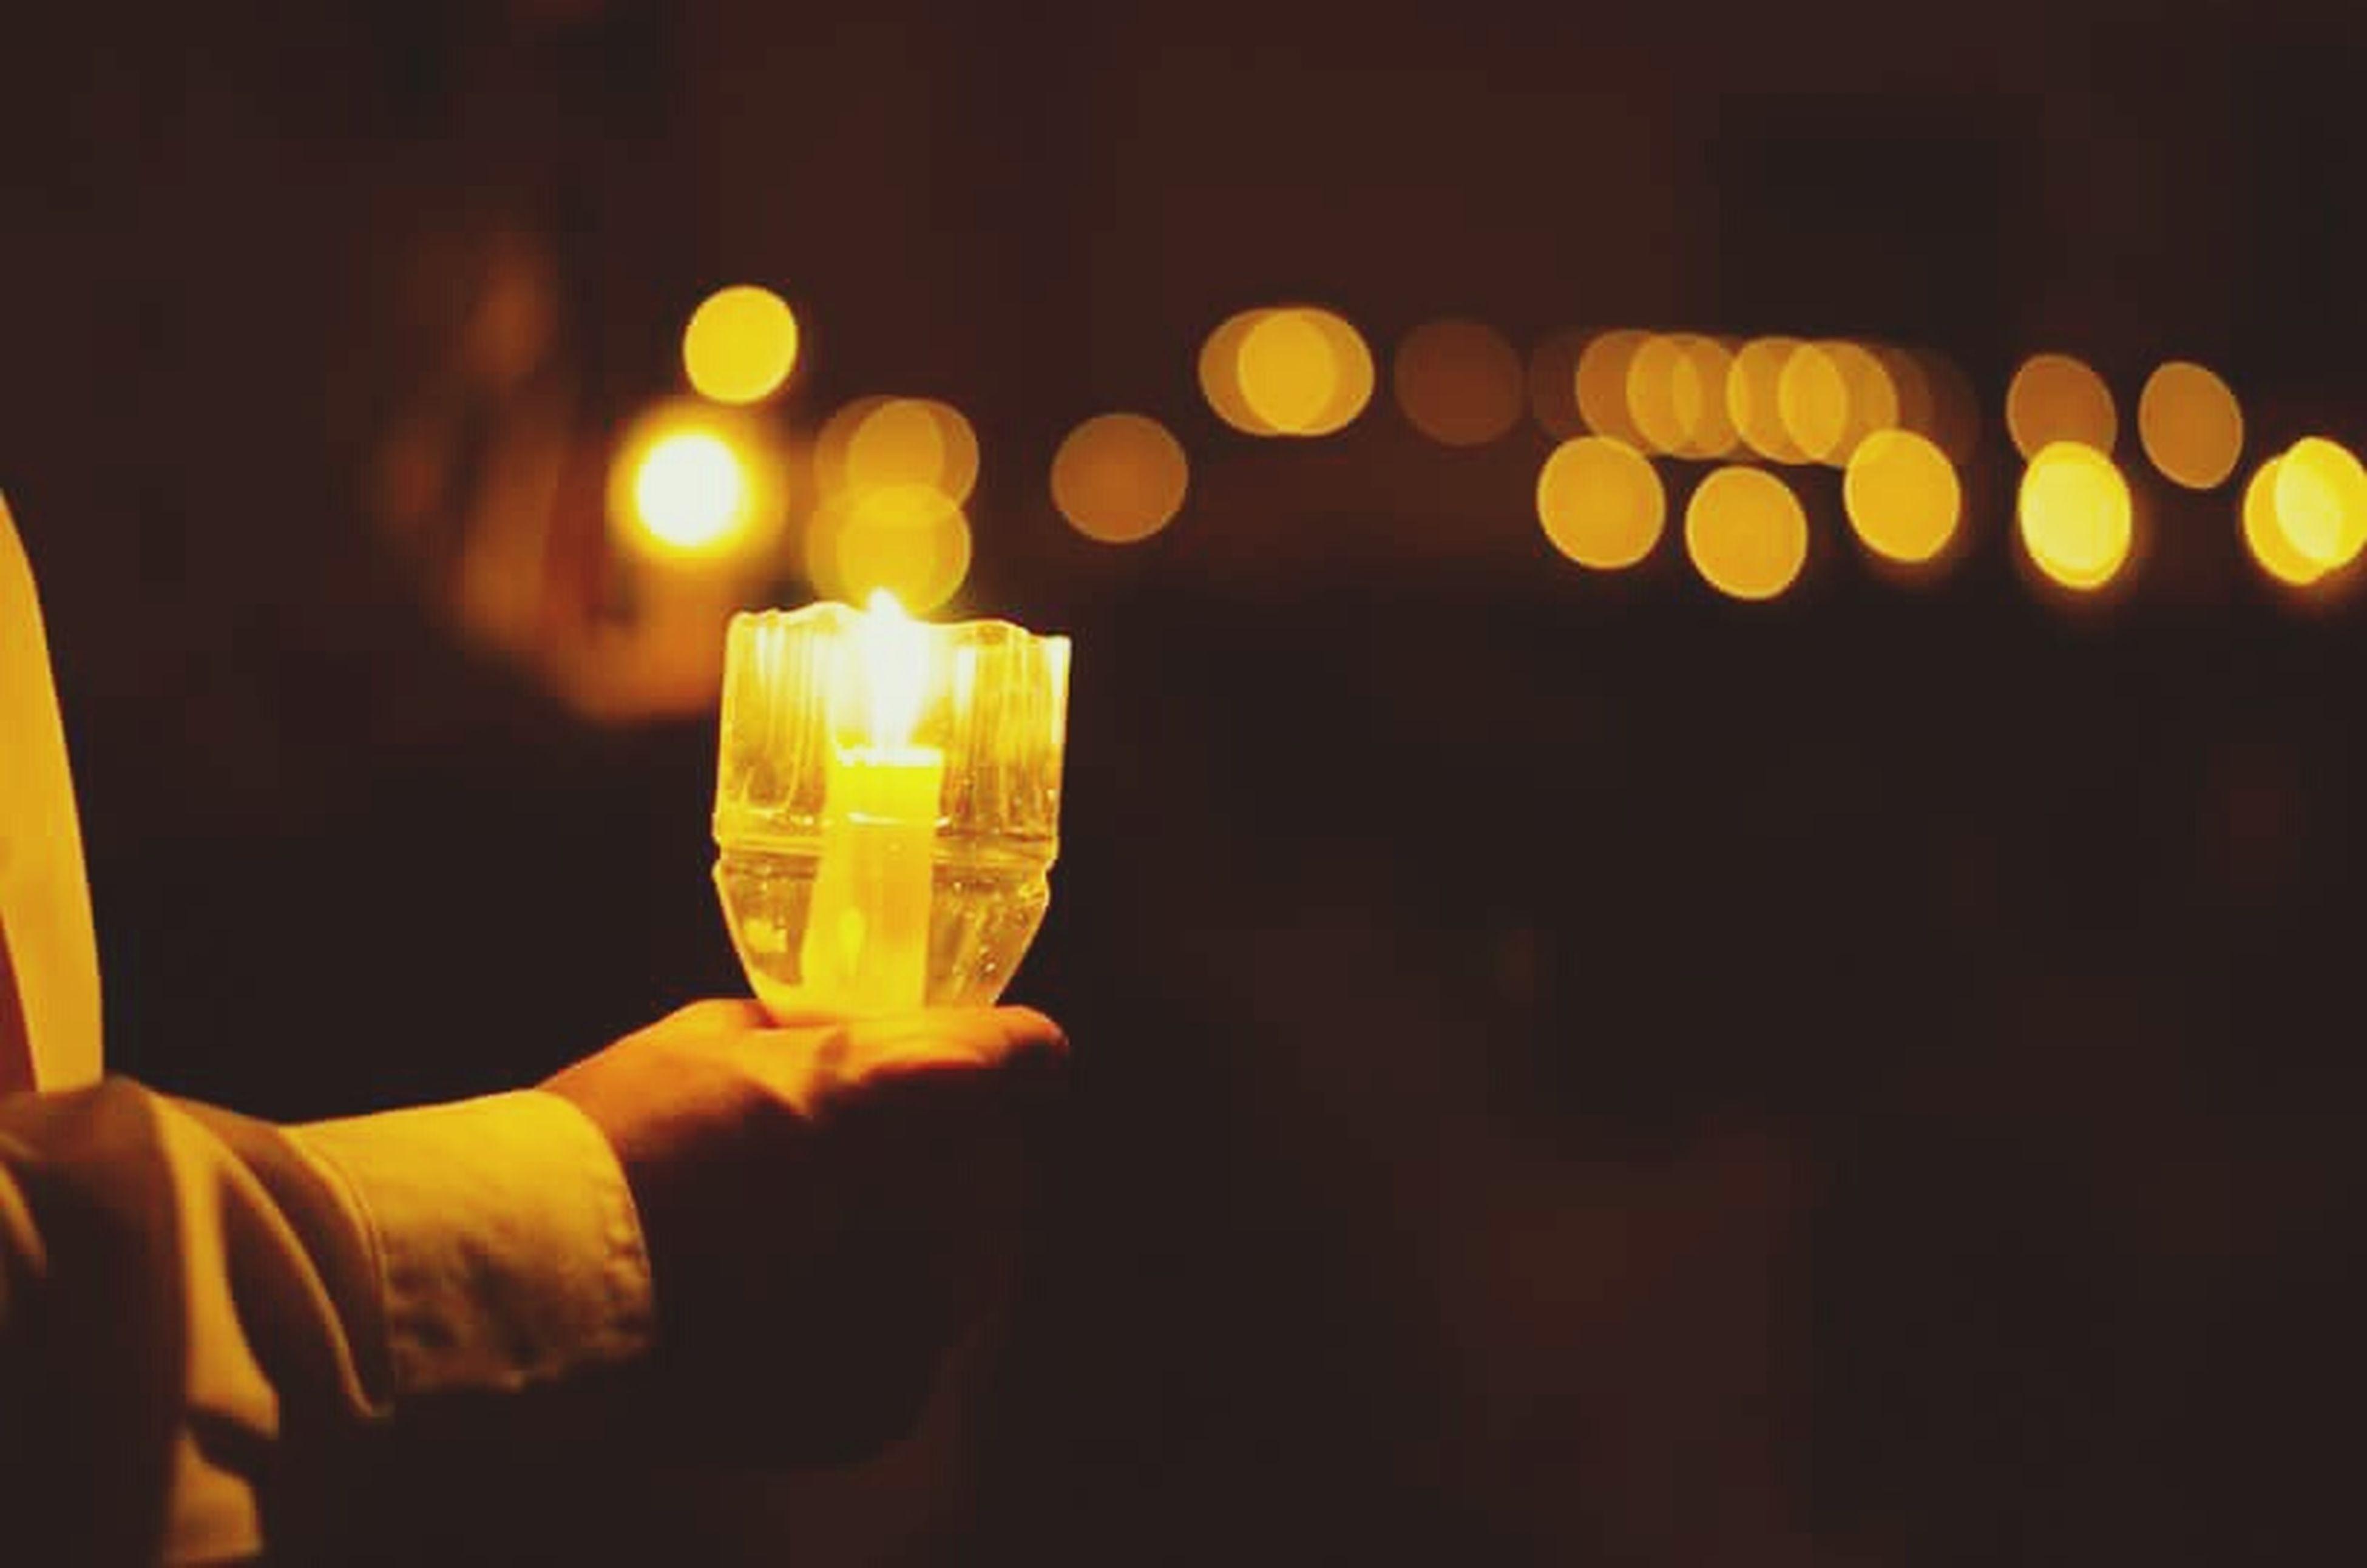 illuminated, lighting equipment, night, indoors, yellow, lit, glass - material, lantern, close-up, glowing, dark, light - natural phenomenon, focus on foreground, light bulb, electricity, light, electric light, decoration, candle